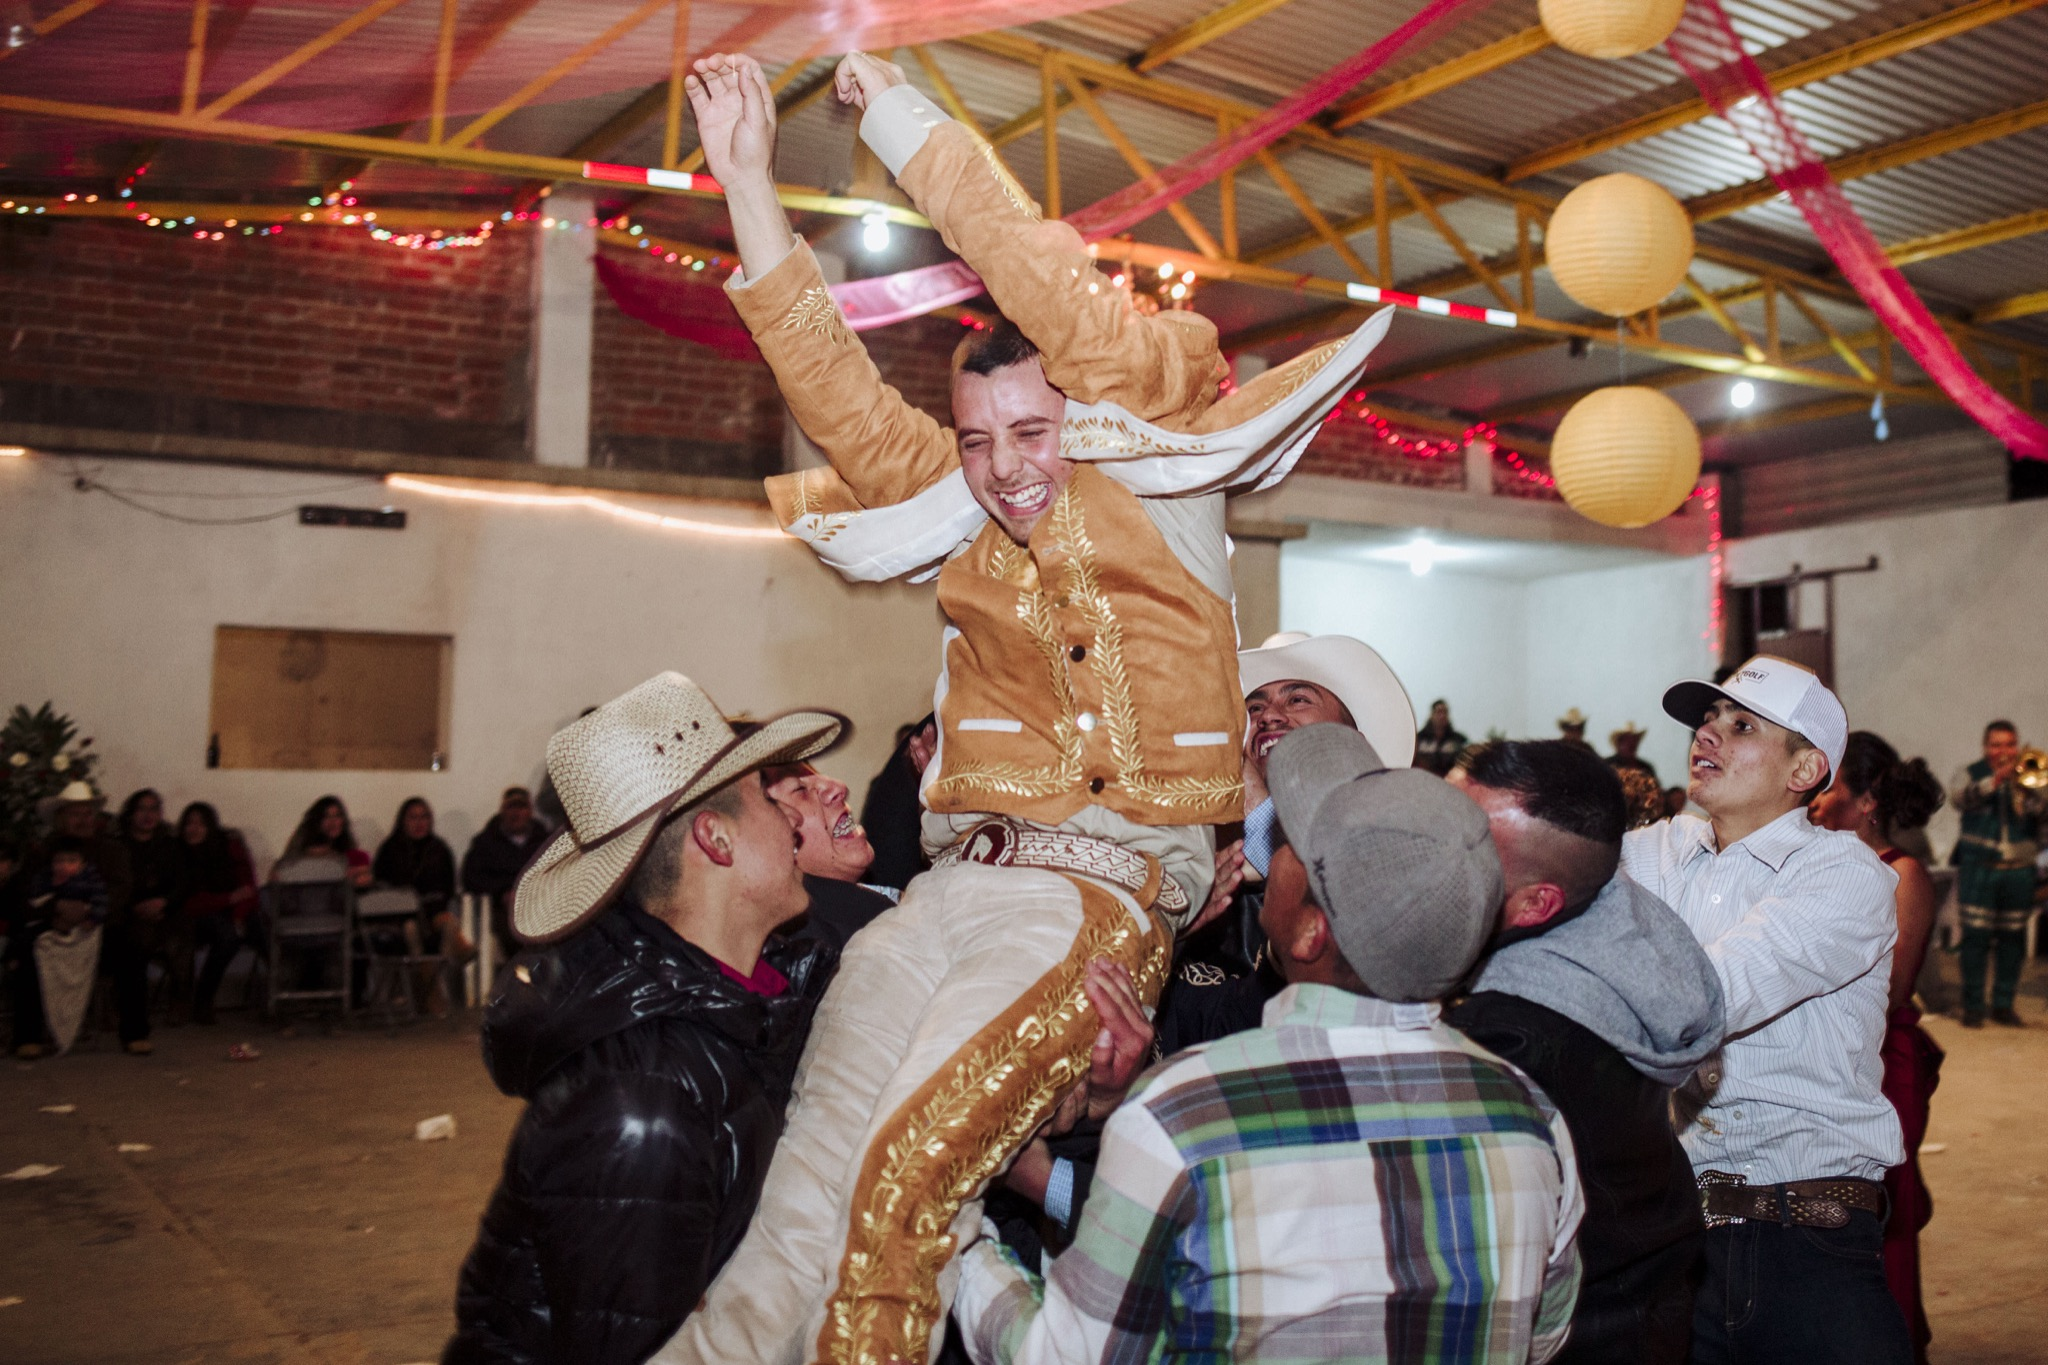 javier_noriega_fotografo_profesional_bodas_zacatecas_mexico_chihuahua_photographer_28